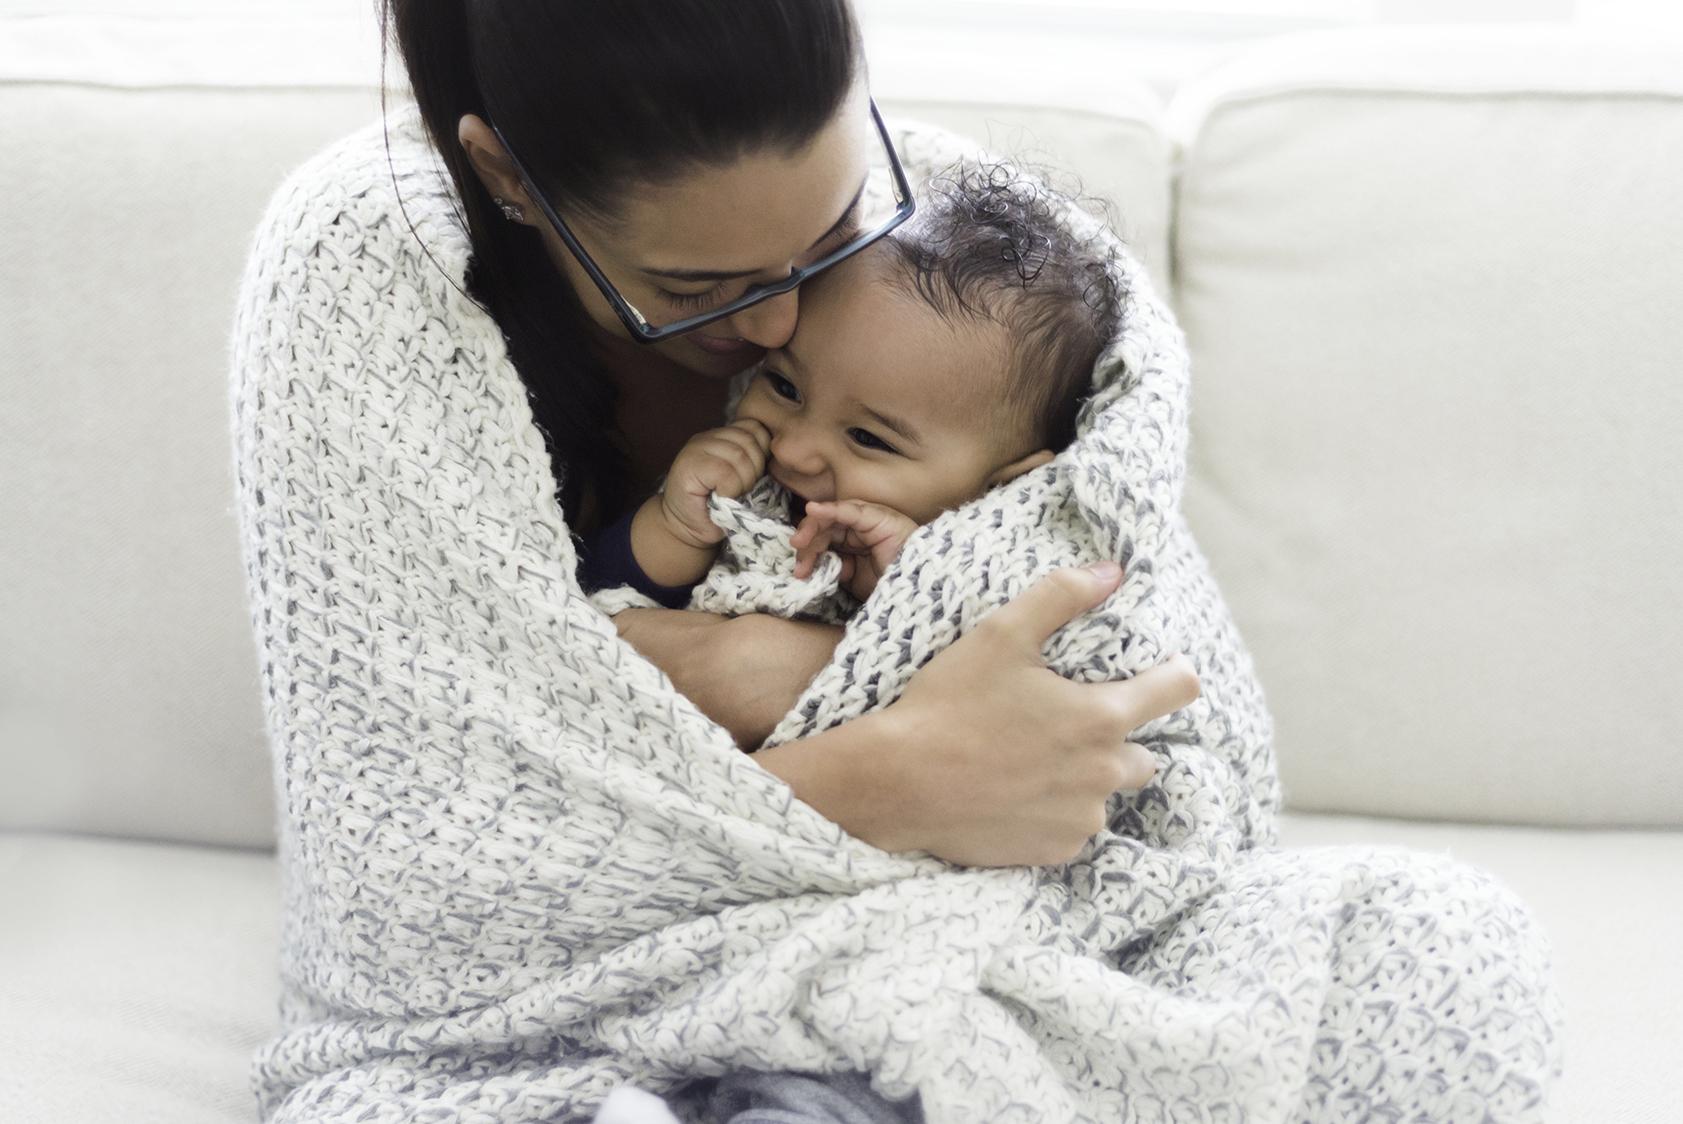 baby-snuggles_t20_b8Wr4X